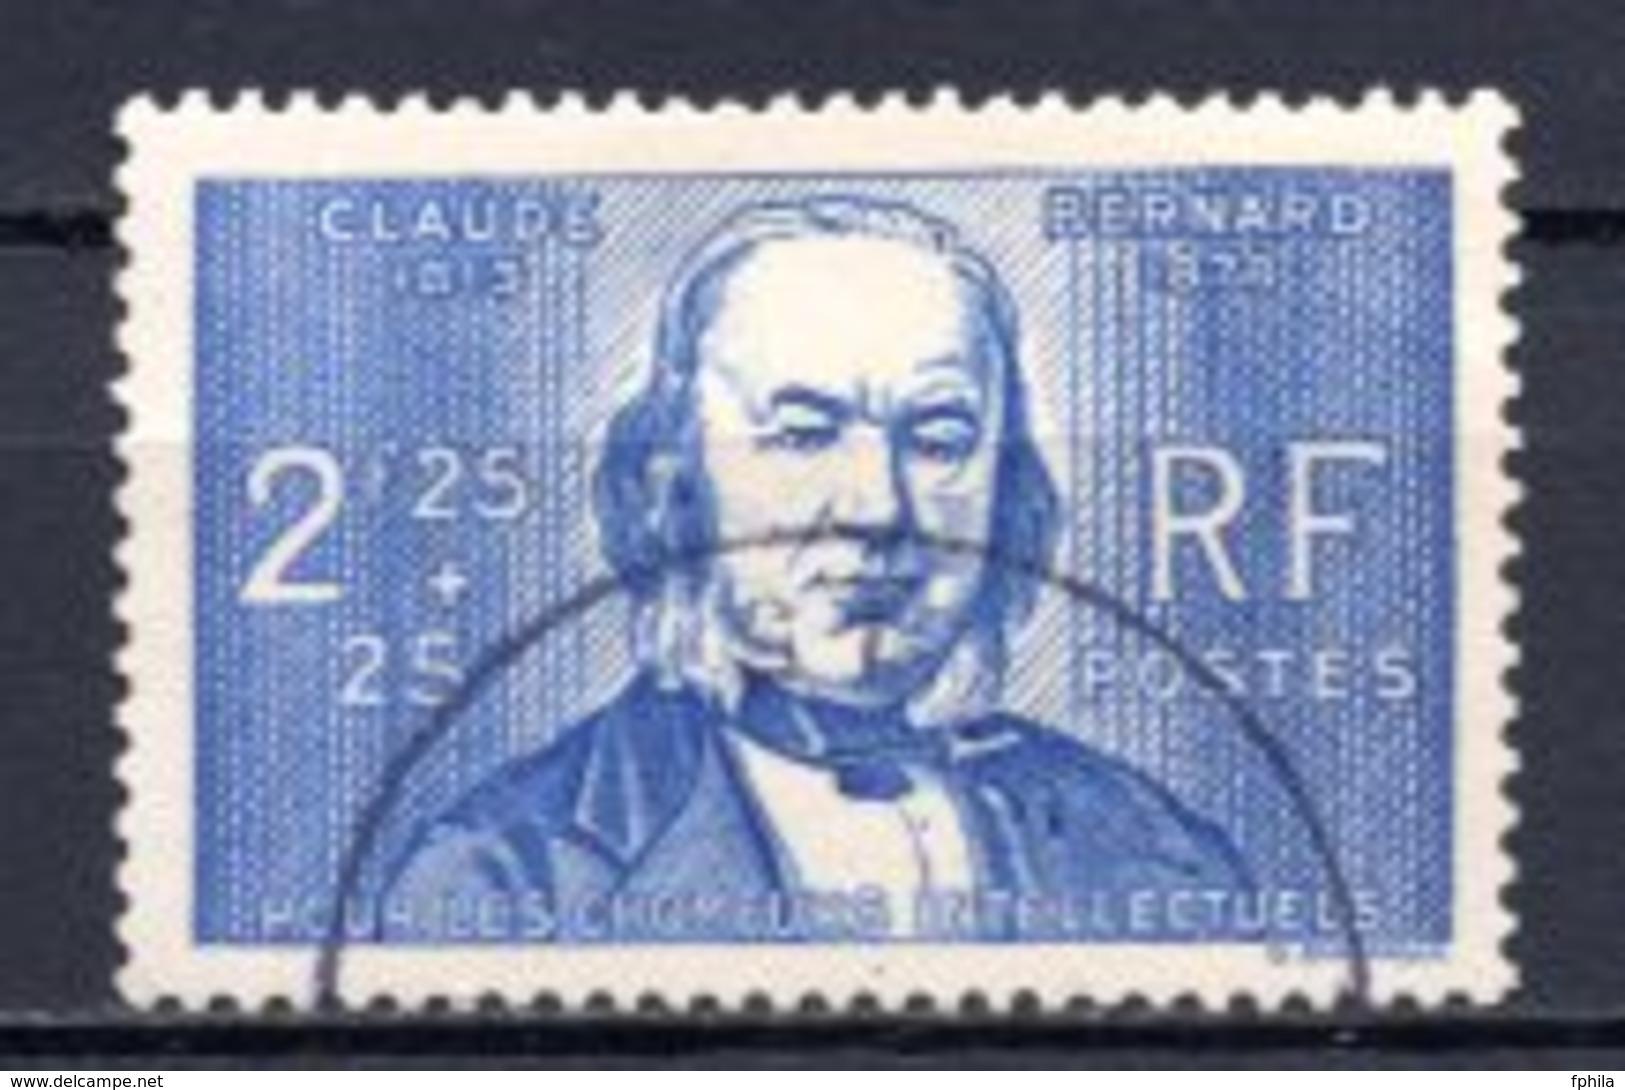 1939 FRANCE 2.25FR.+25C. CLAUDE BERNARD MICHEL: 453 USED - Gebraucht